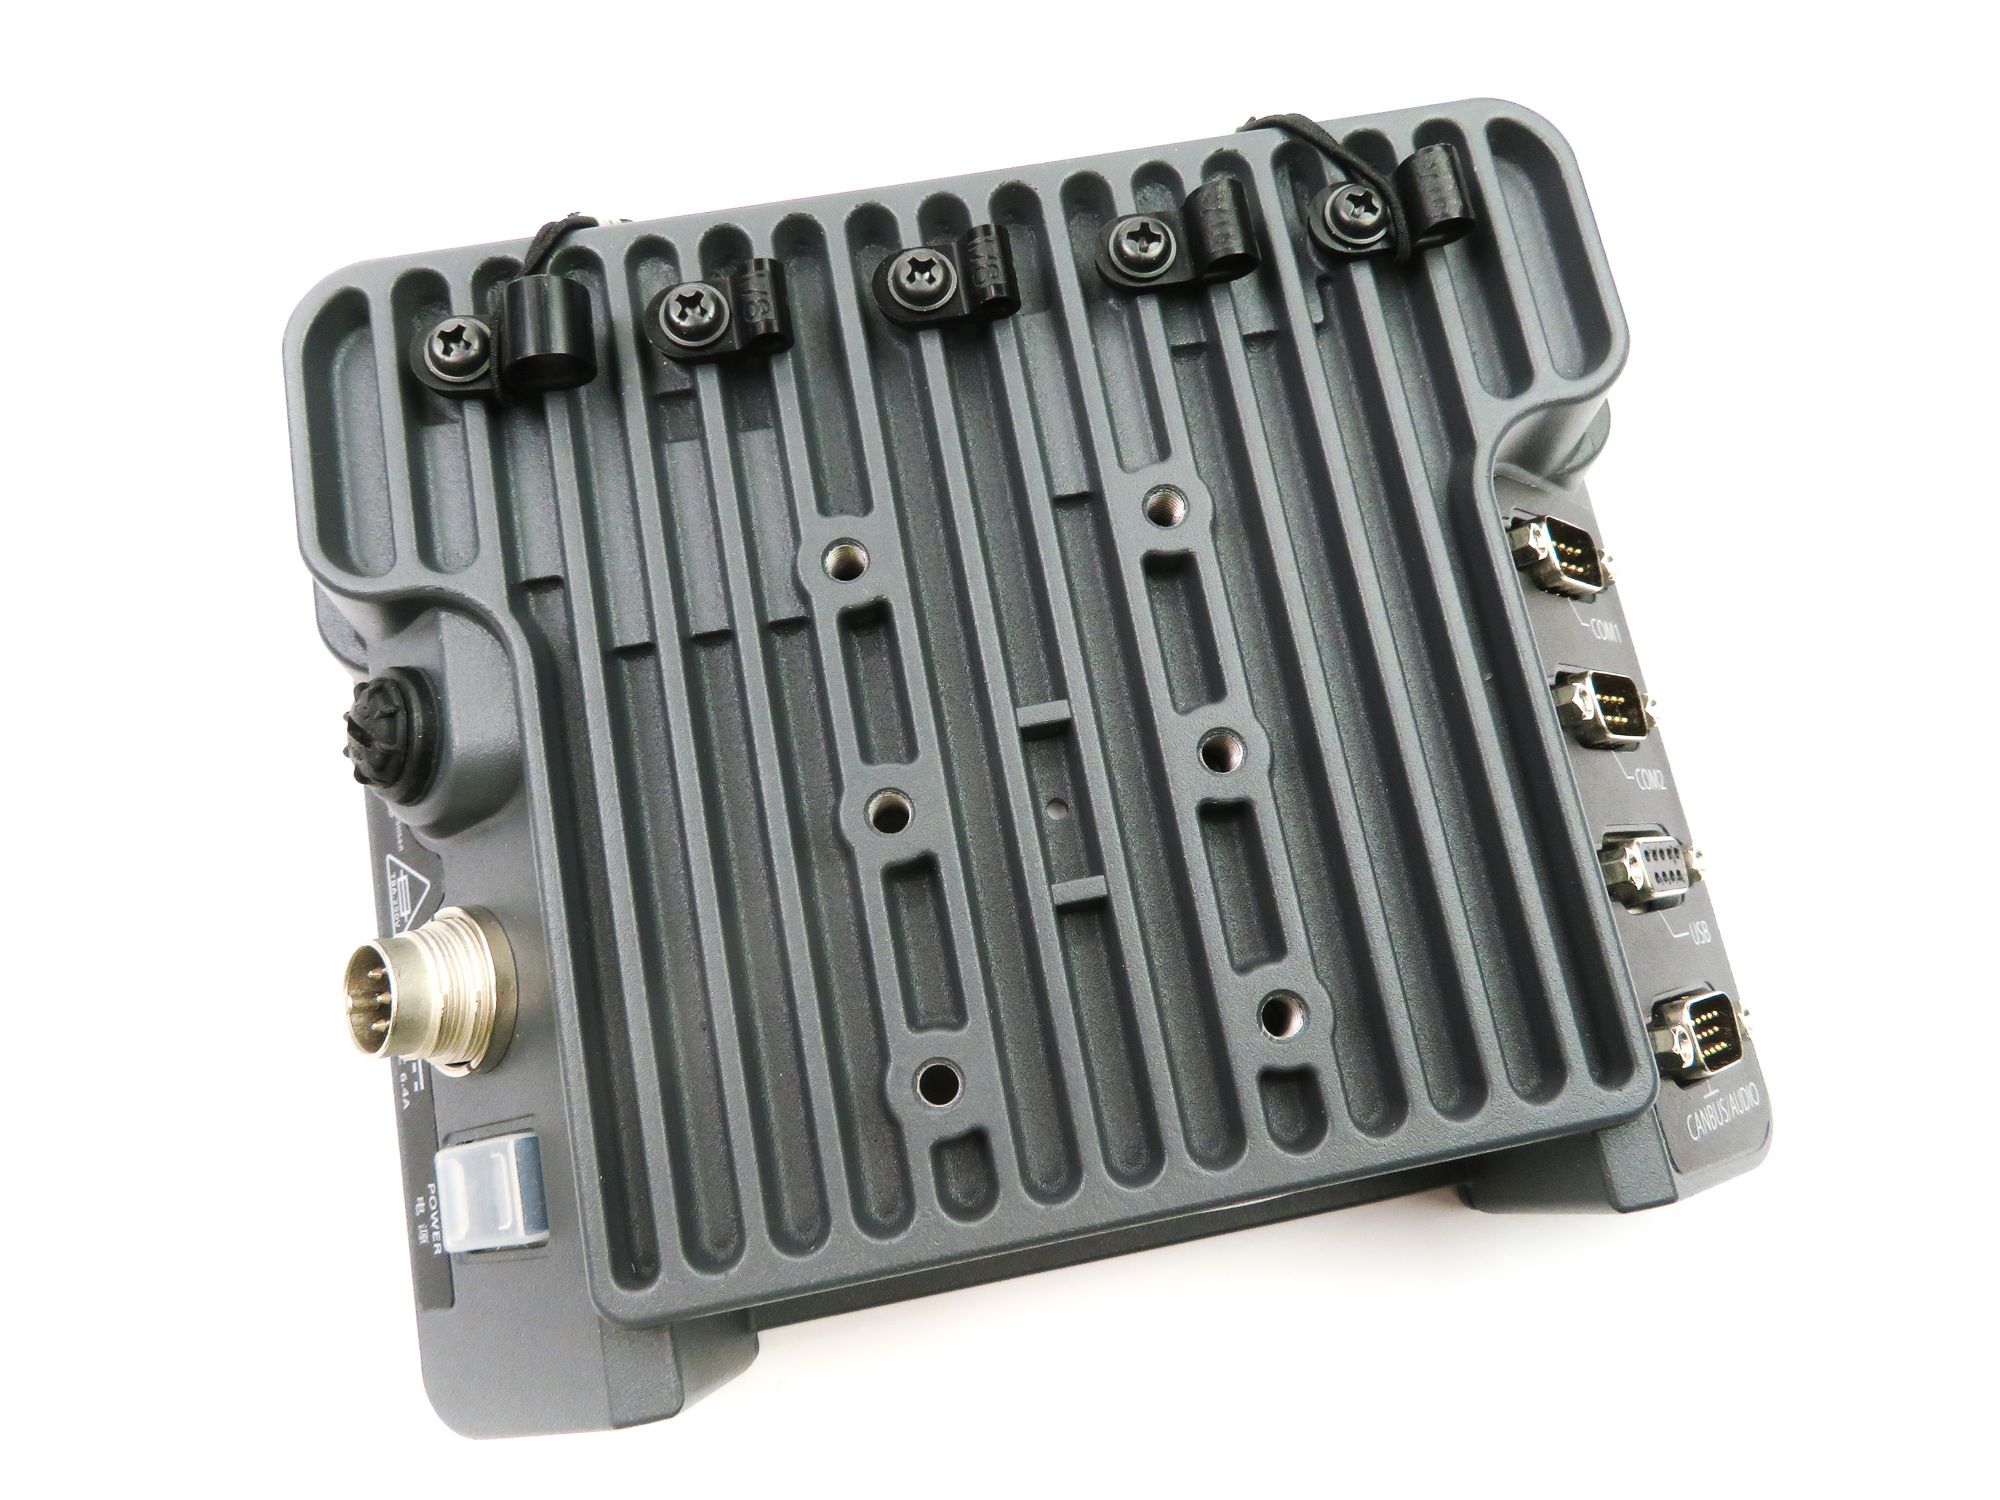 Honeywell 163163-0001 VM1D Power Supply Dock For Thor VM1C Vehicle Mount PC